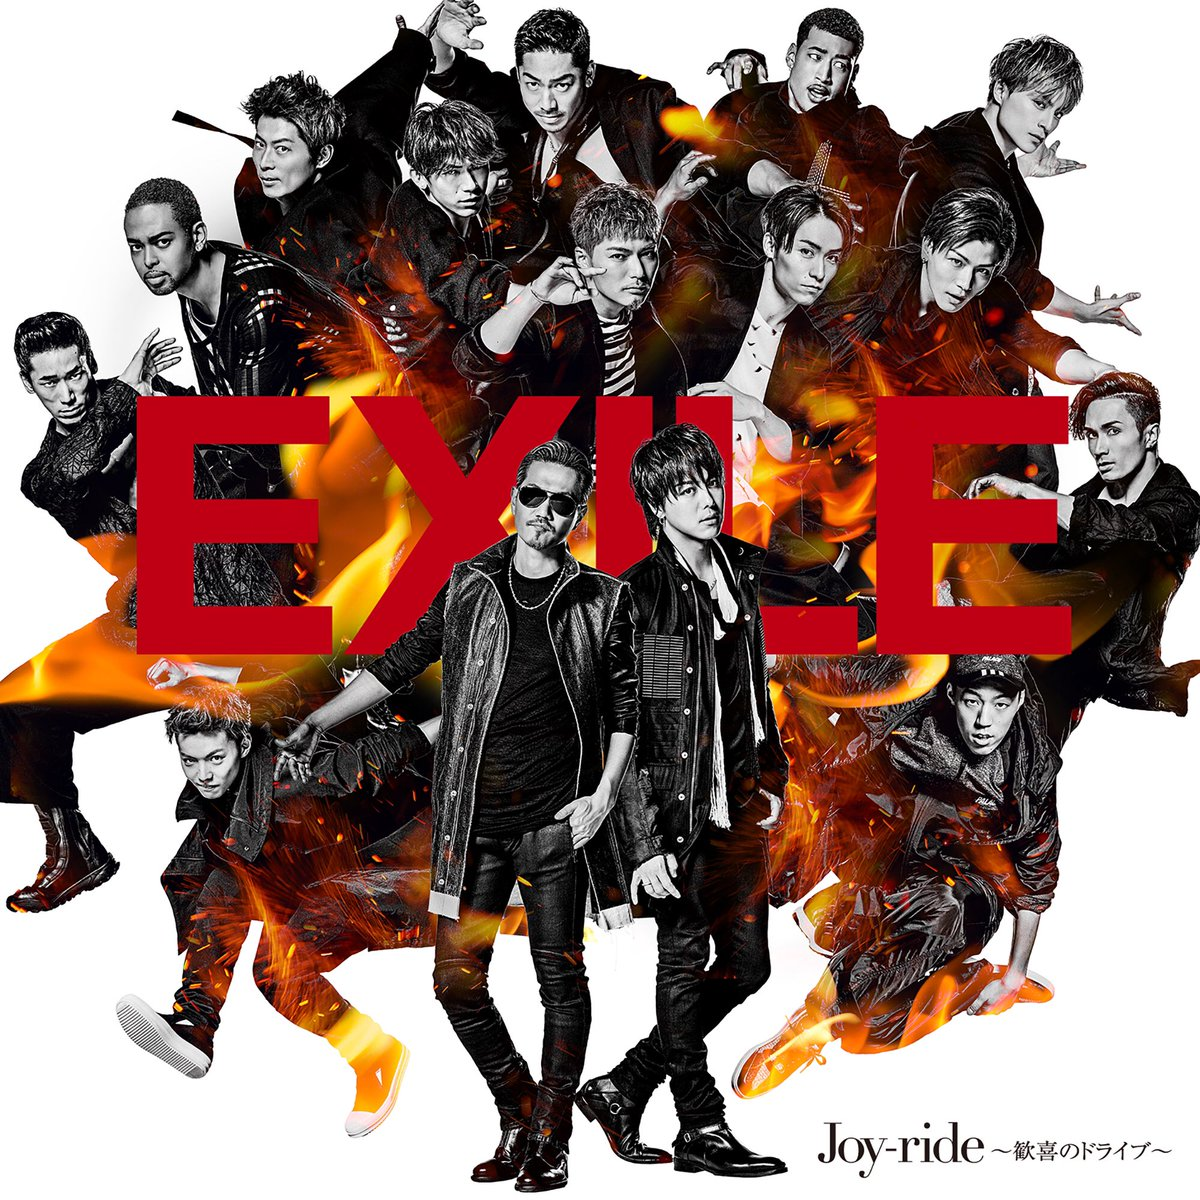 8/17 Release‼️ EXILE【Joy-ride〜歓喜のドライブ〜】情報解禁🙌🏻✨   共…